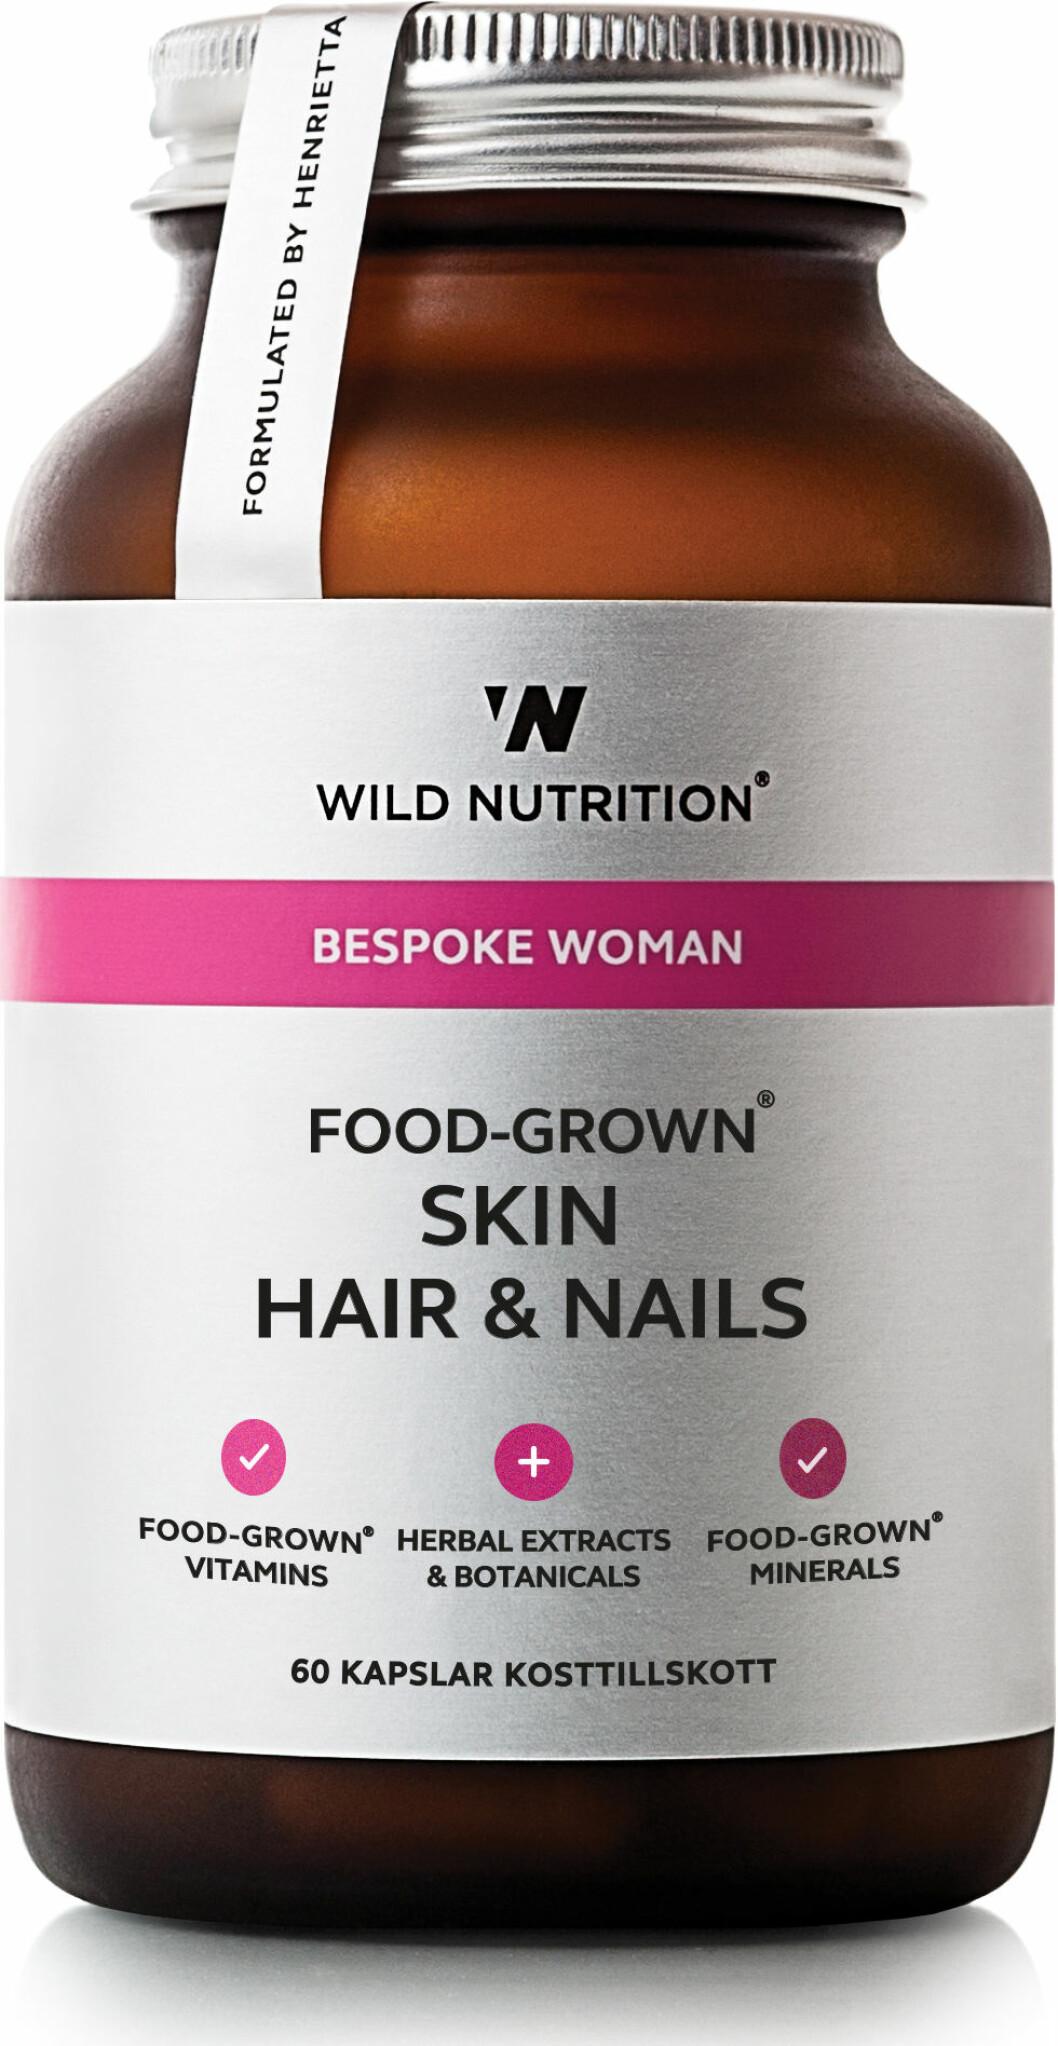 Skin hair & nails, Wild nutrition.